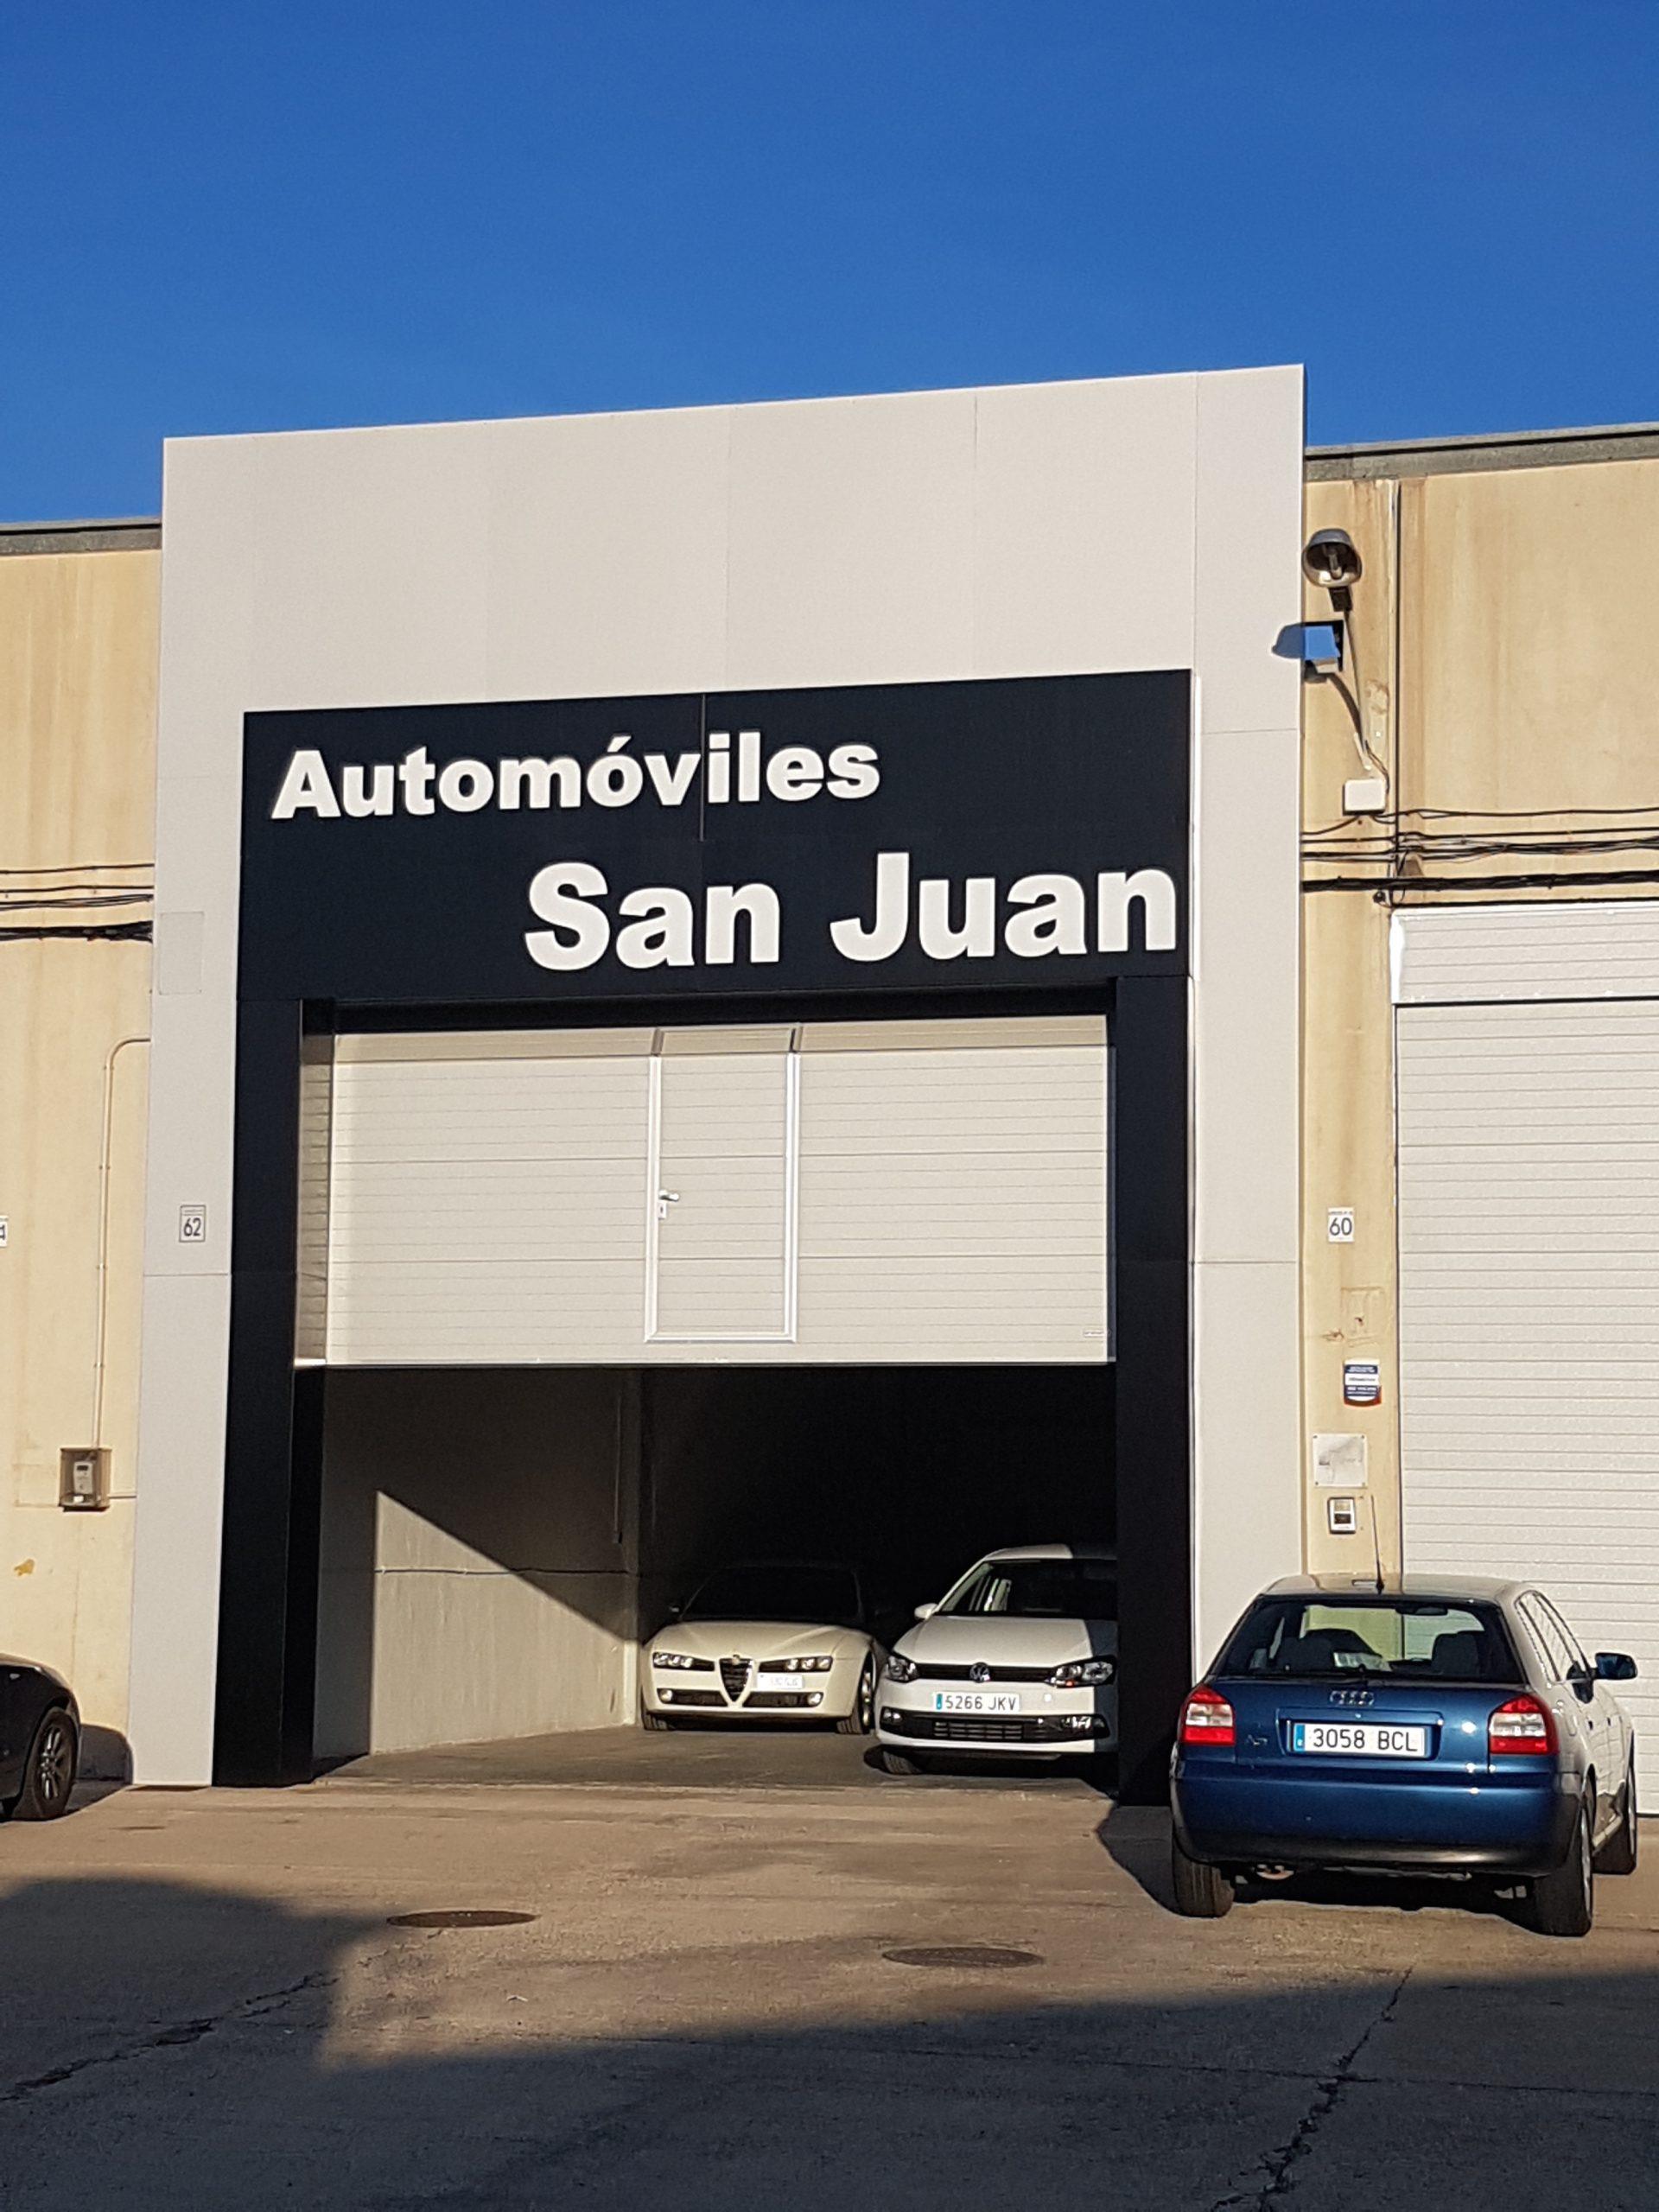 Automoviles SDAN JUAN 3